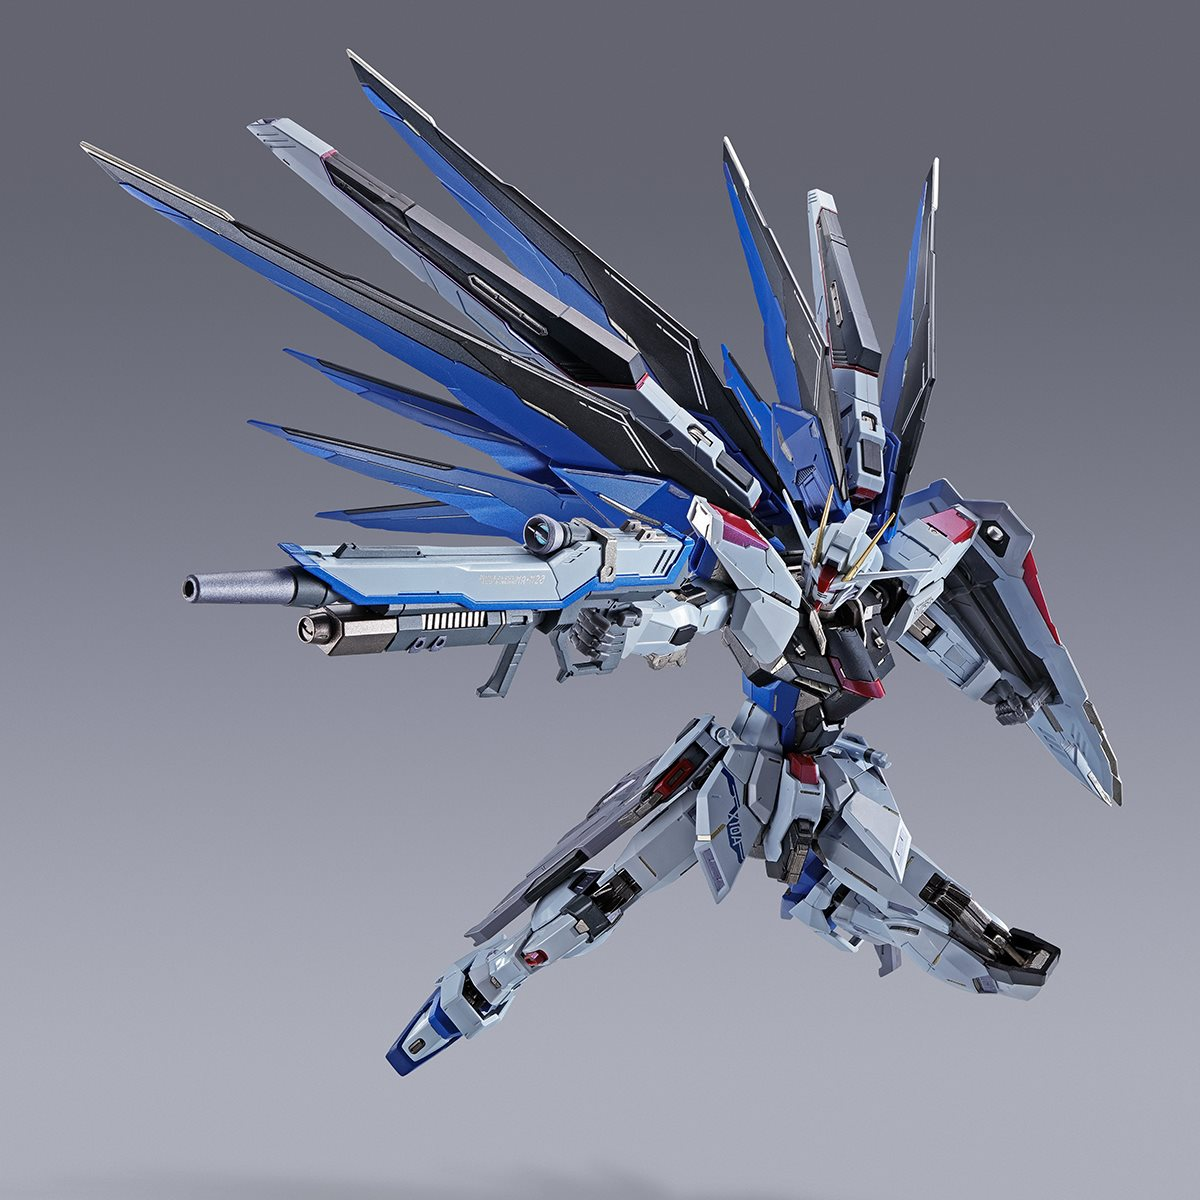 NEW BANDAI METAL BUILD USA DIE-CAST Freedom Gundam Concept 2 Action figure